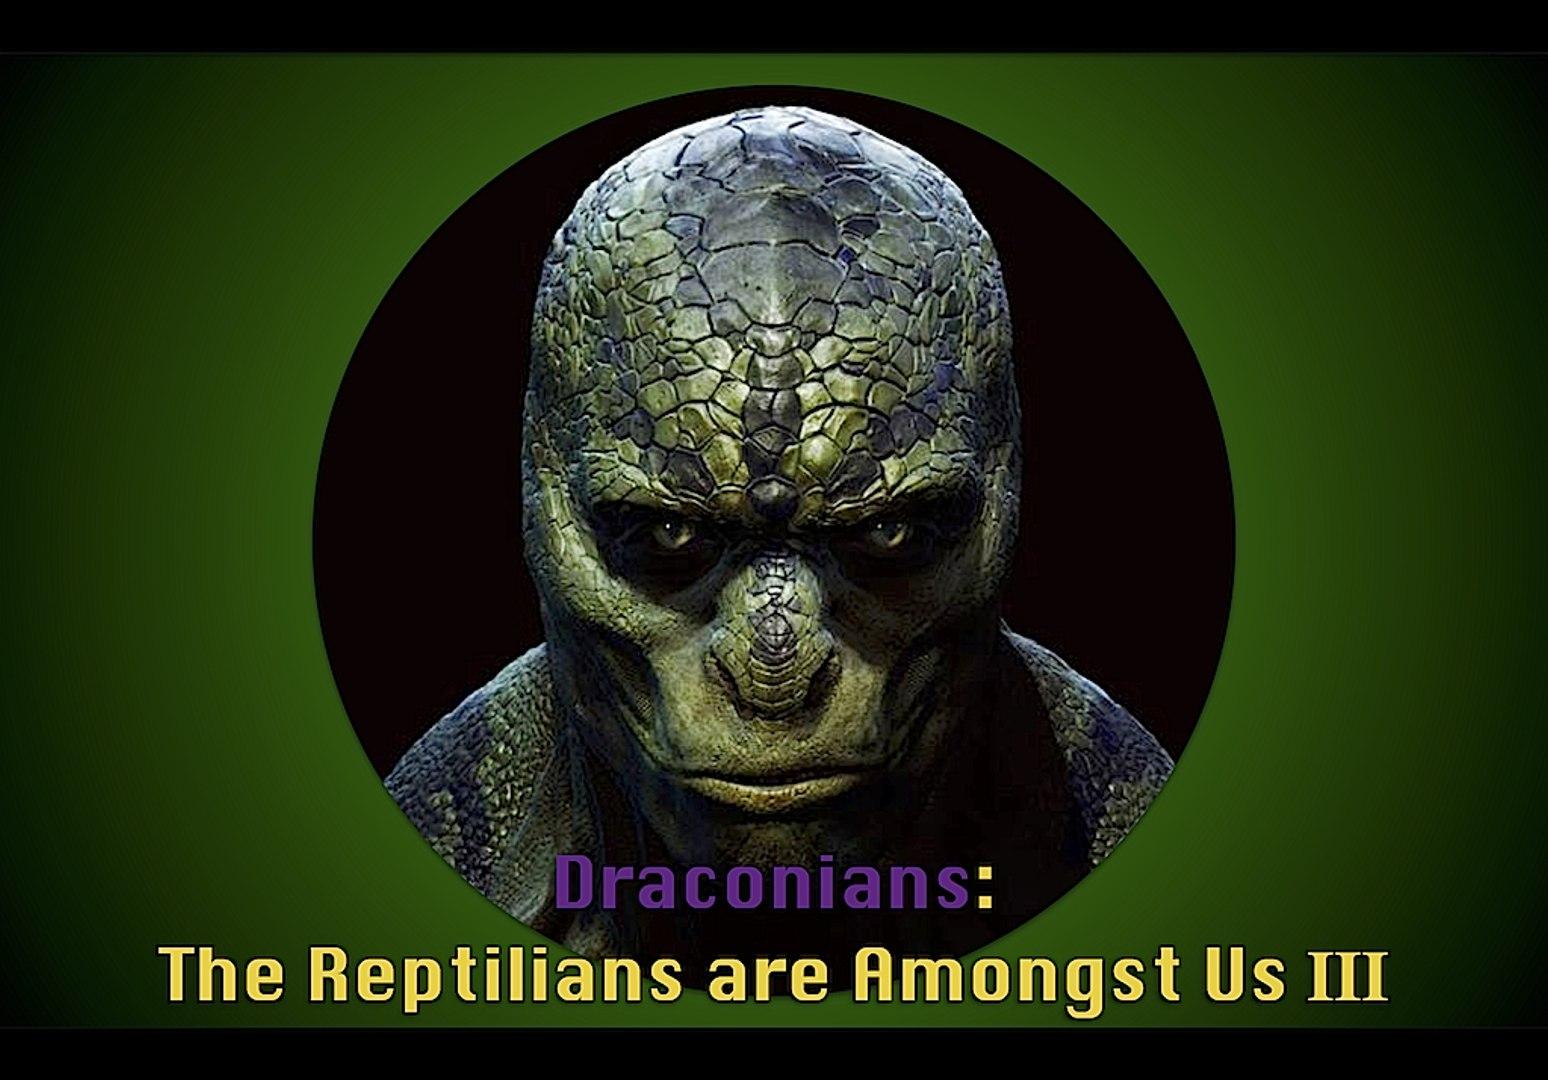 COG - Draconians: The Reptilians are Amongst Us -3 (Satanism, Gematria, &  Evidence)